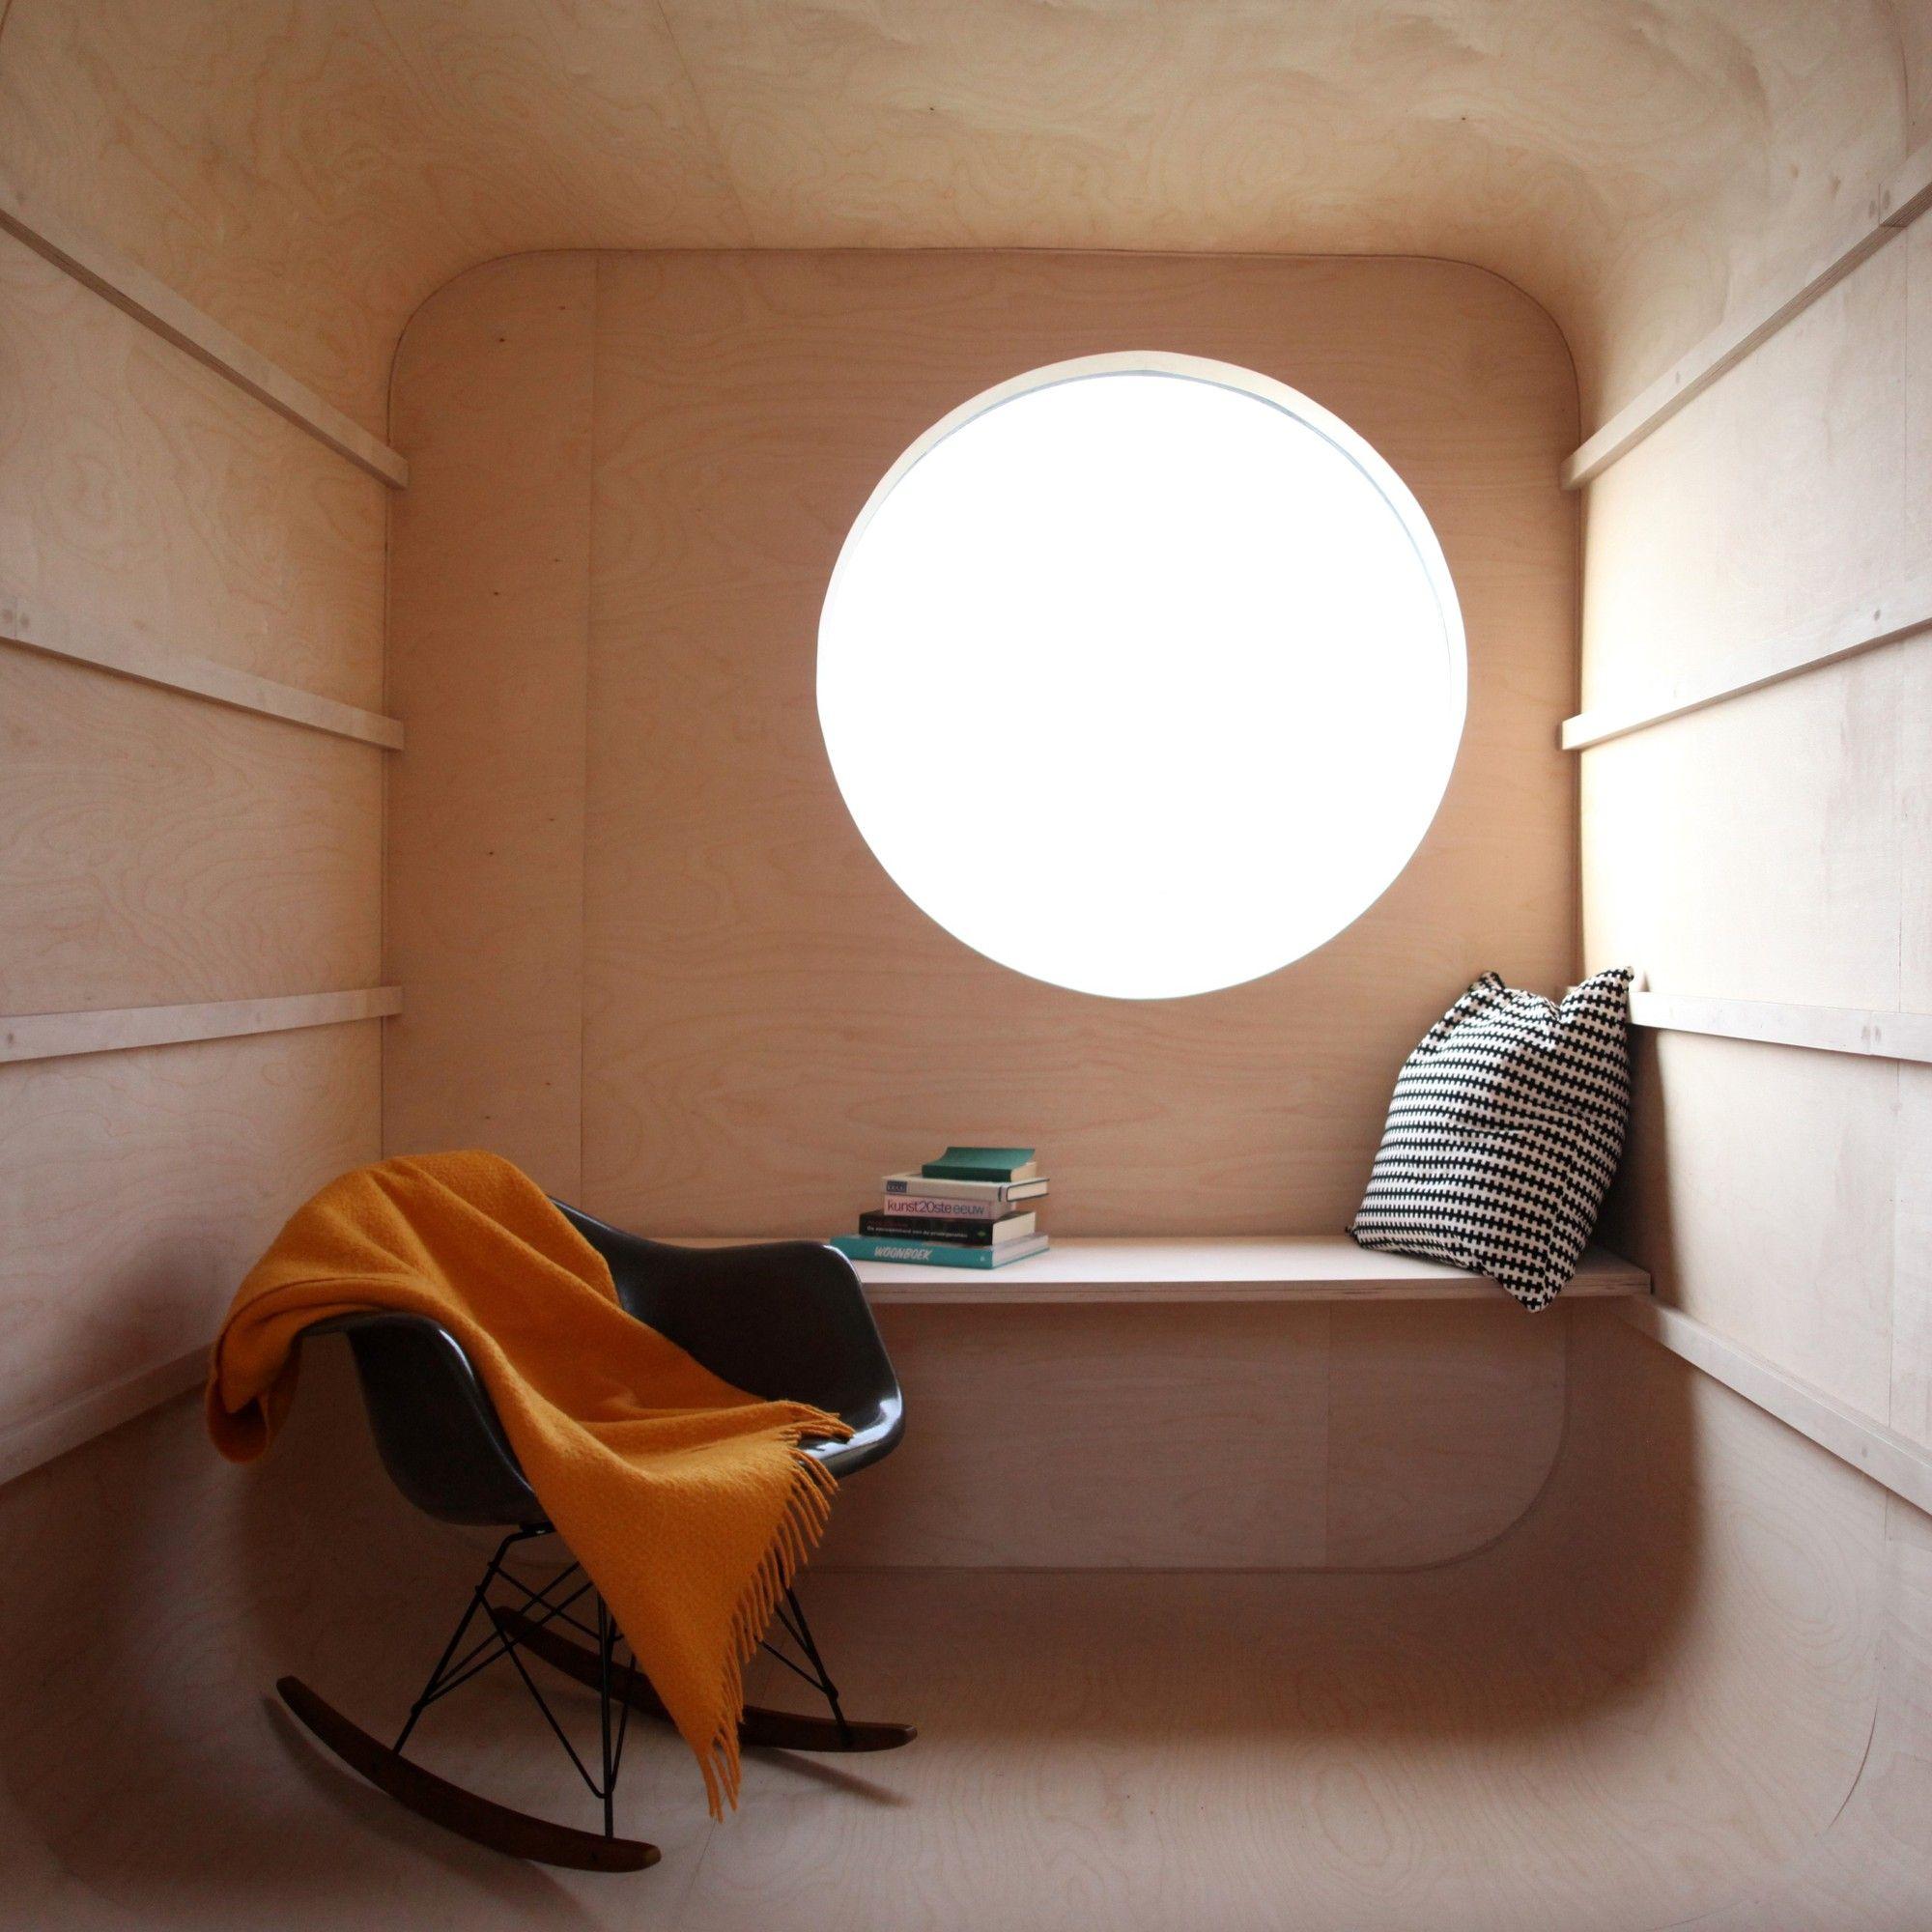 Construction Trailer Conversion - Karel Verstraet - Tiny Space - Interior Desk - Humble Homes